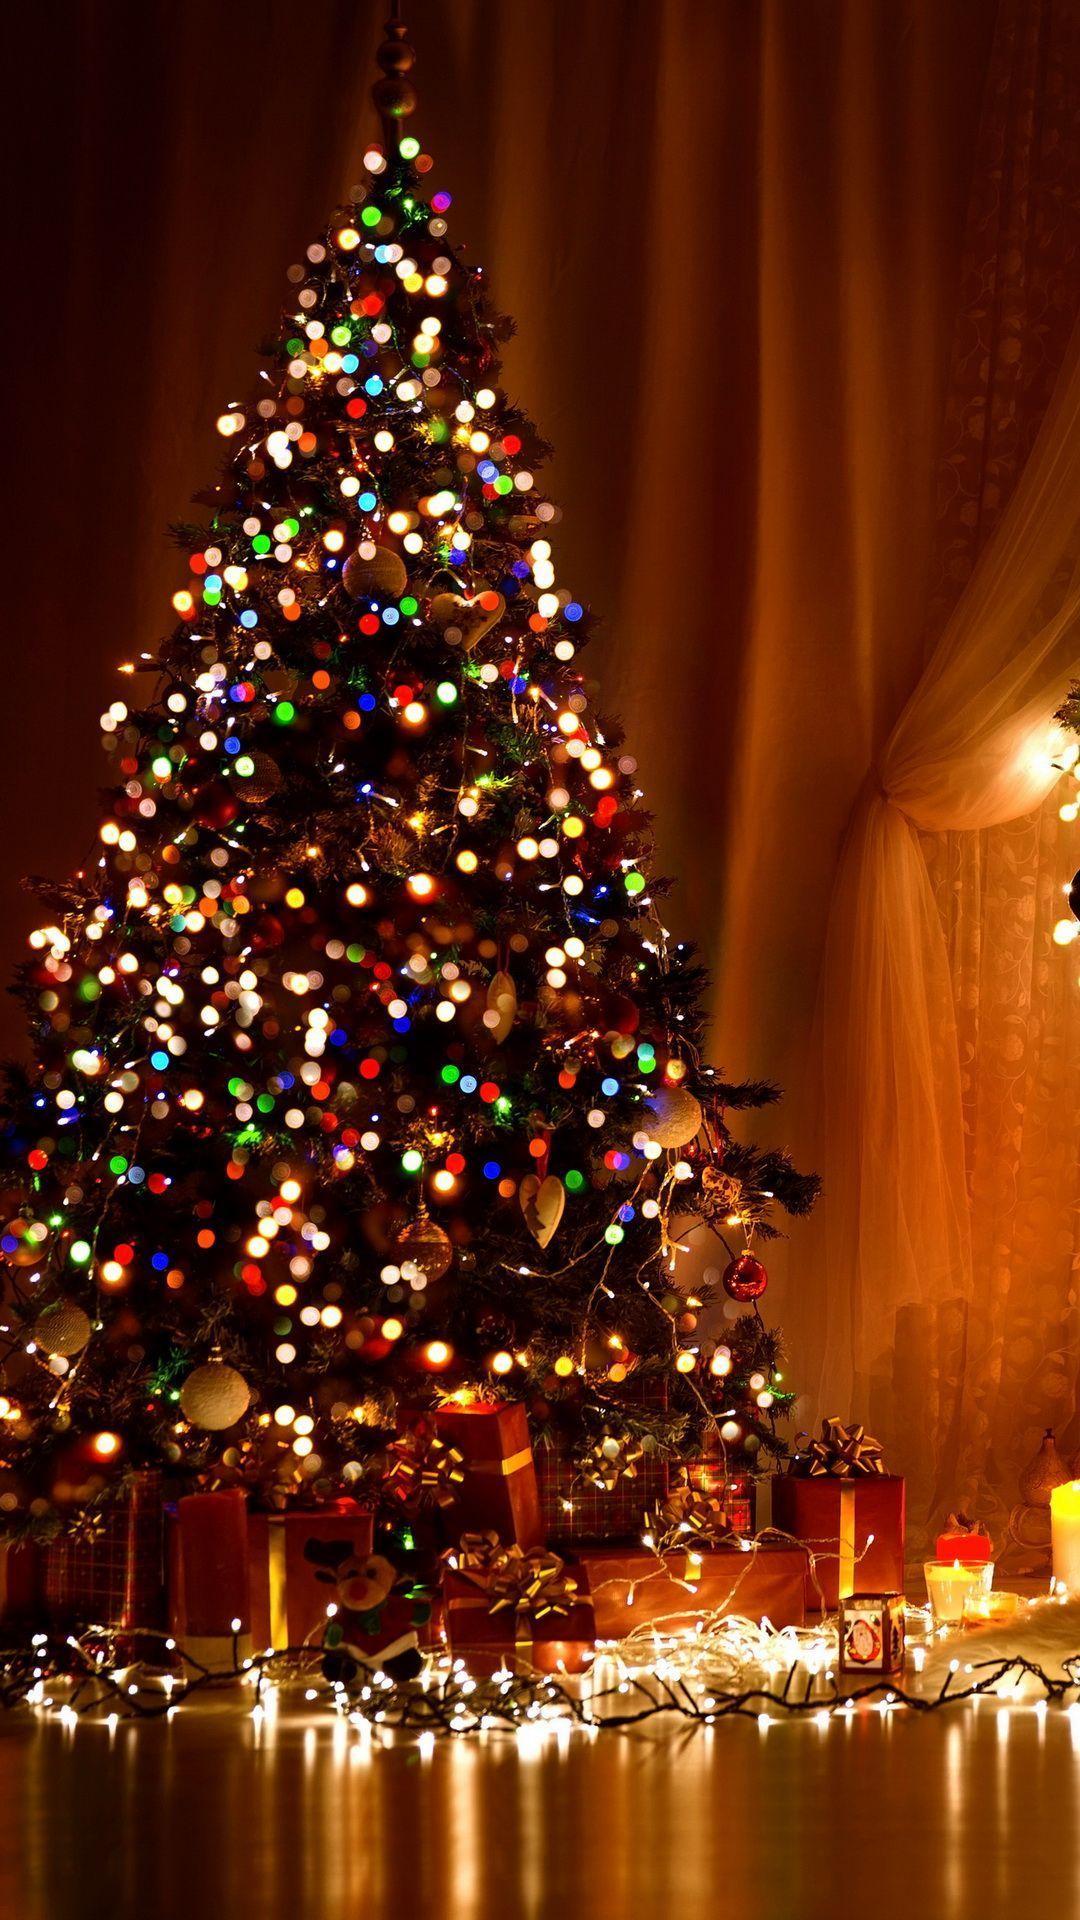 Christmas Aesthetic Wallpapers - Top Free Christmas ...